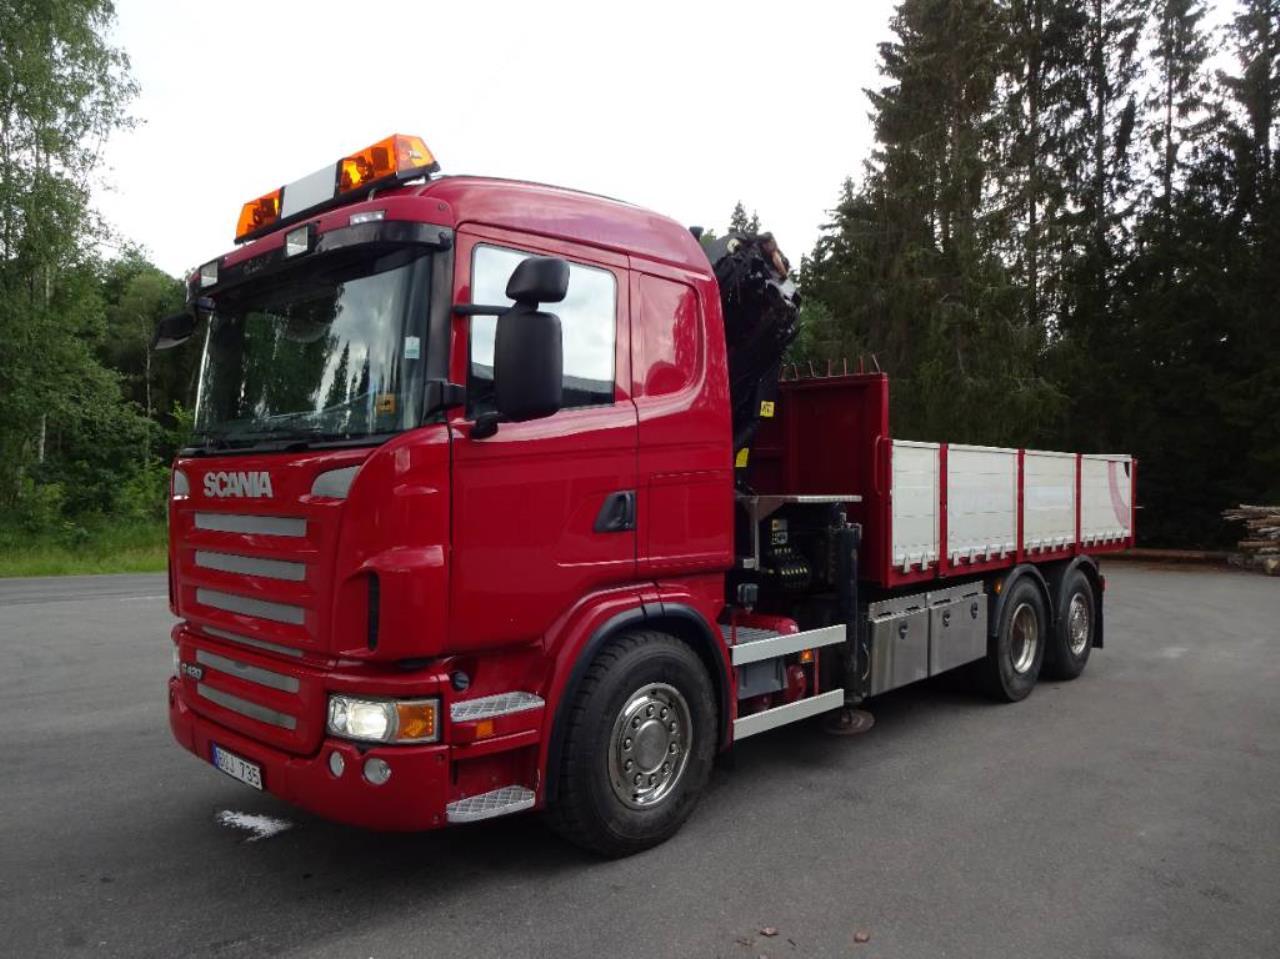 Scania Tipp & kranbil G420lb6x2*4hna 2010 - Kran